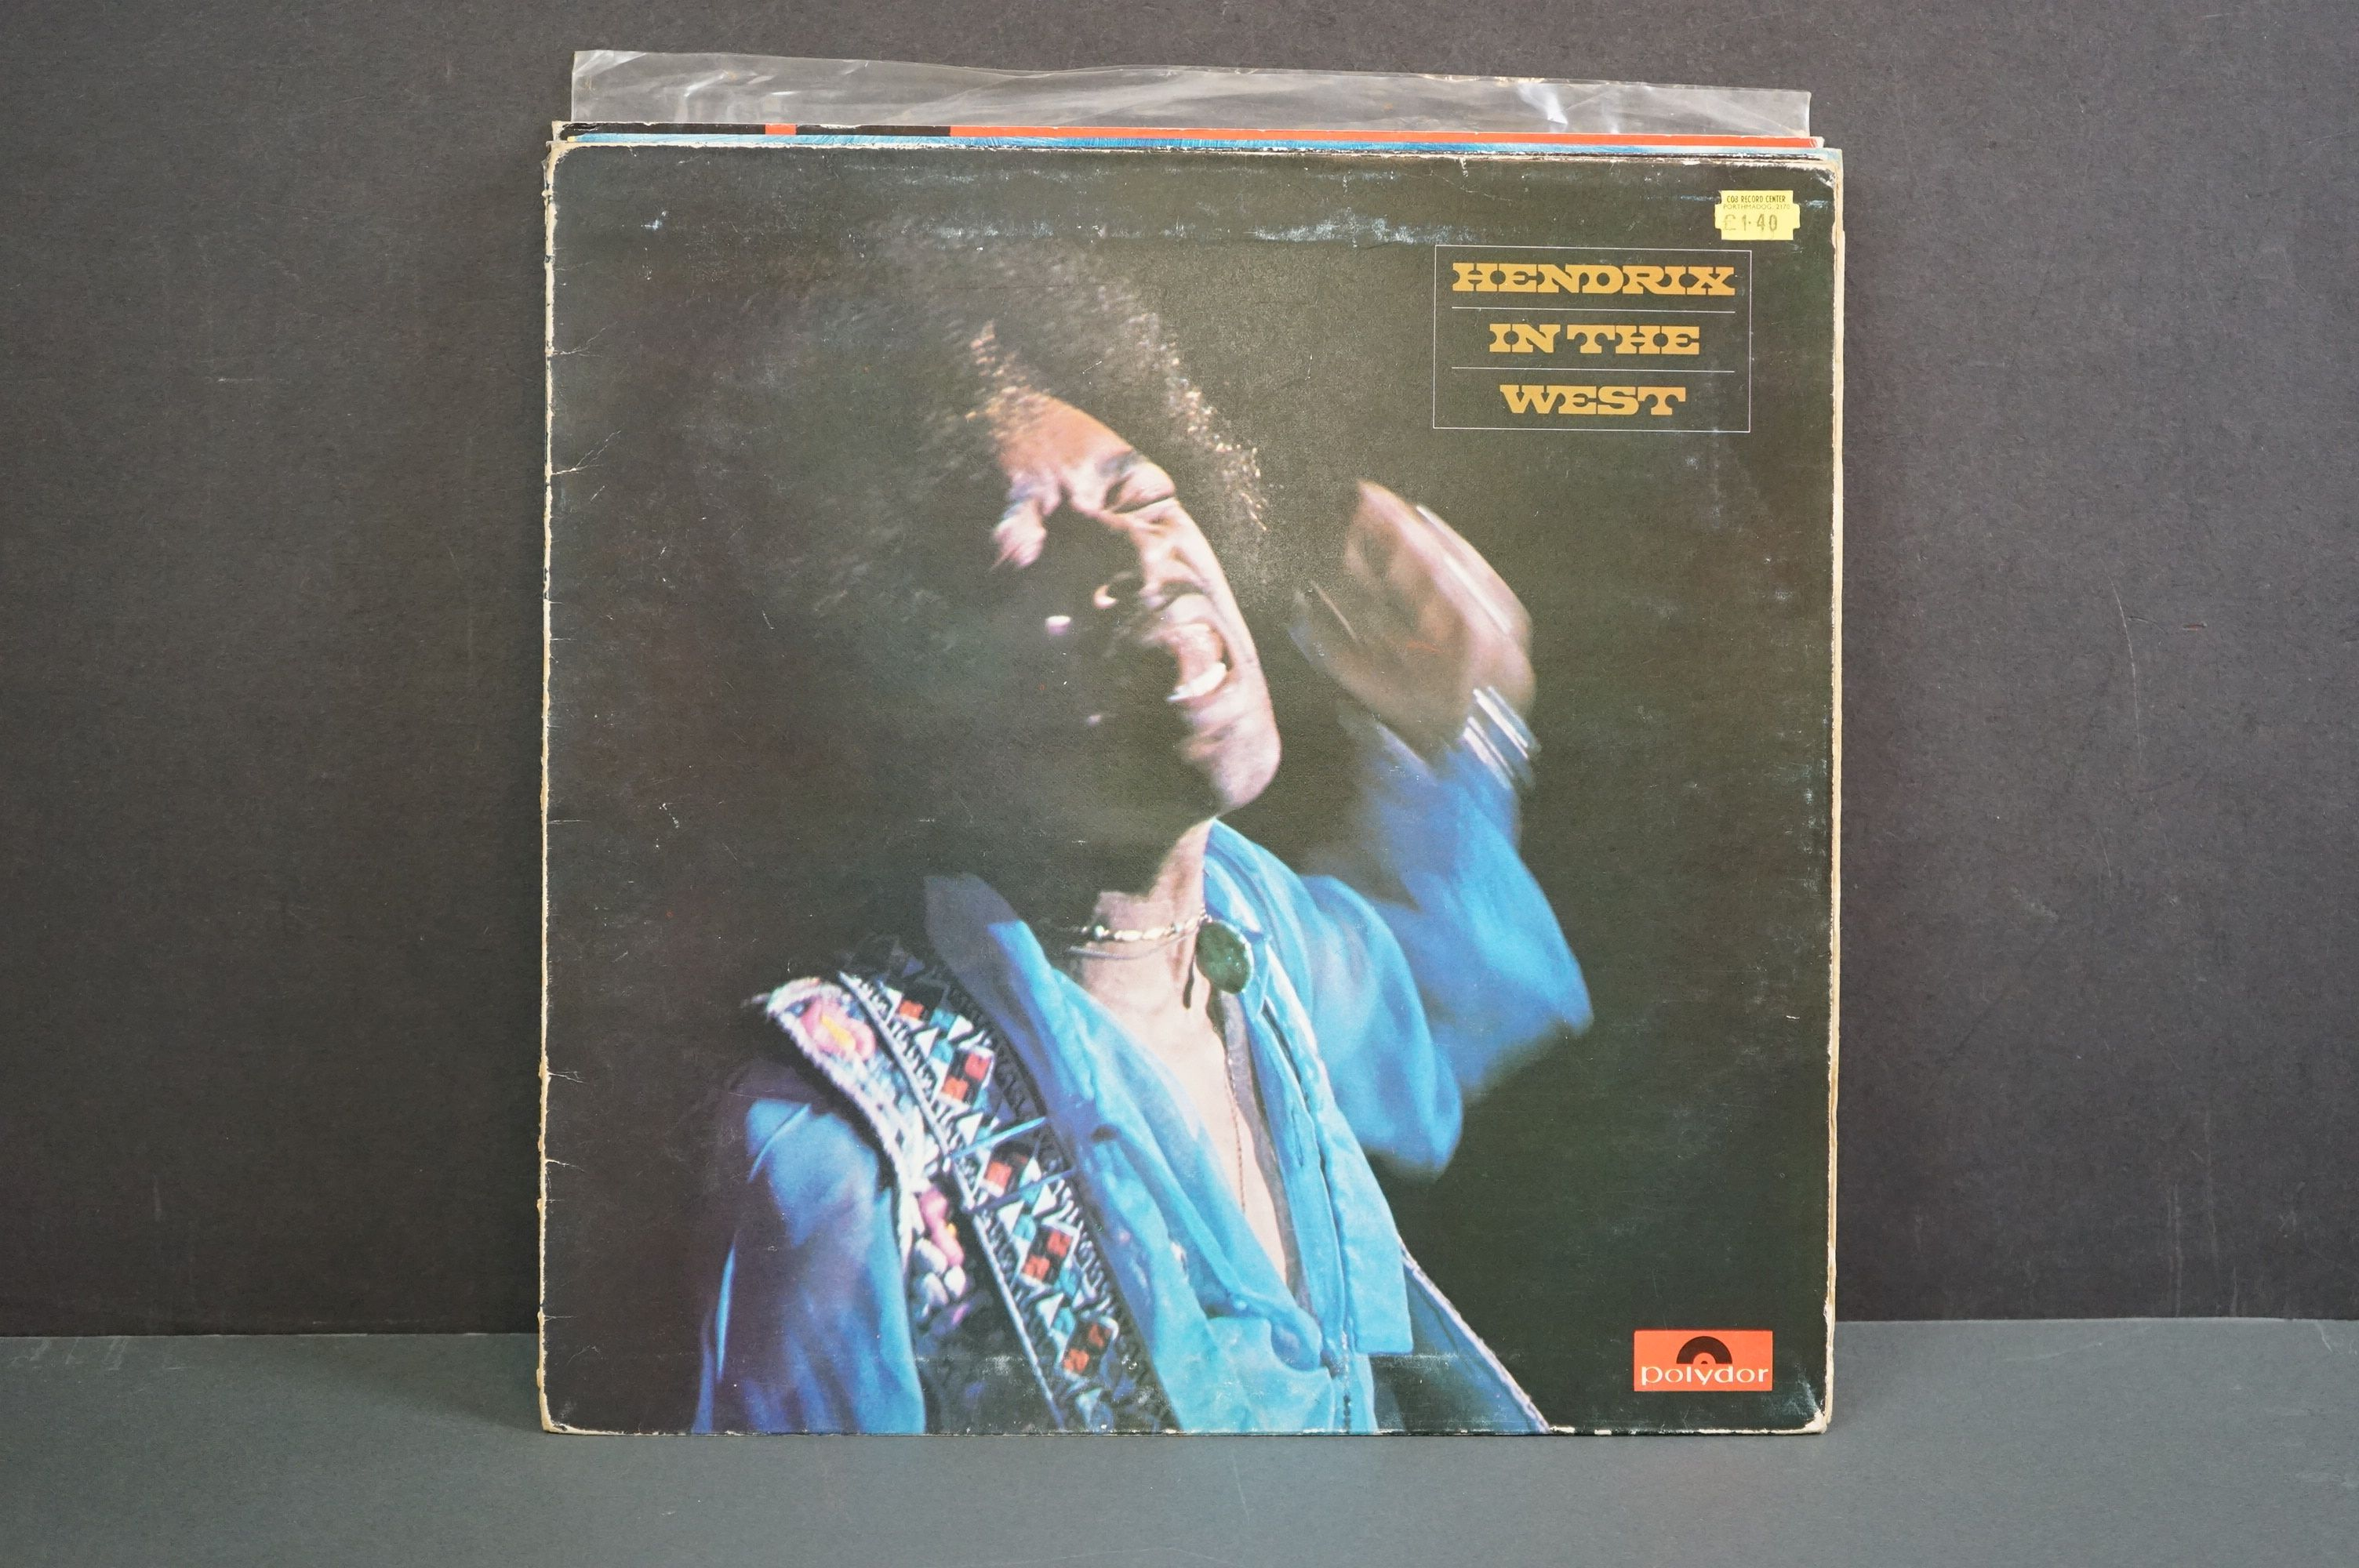 Vinyl - Nine Jimi Hendrix LPs to include Smash Hits, Hey Joe (Italian pressing), Stone Free, Jimi - Image 5 of 9